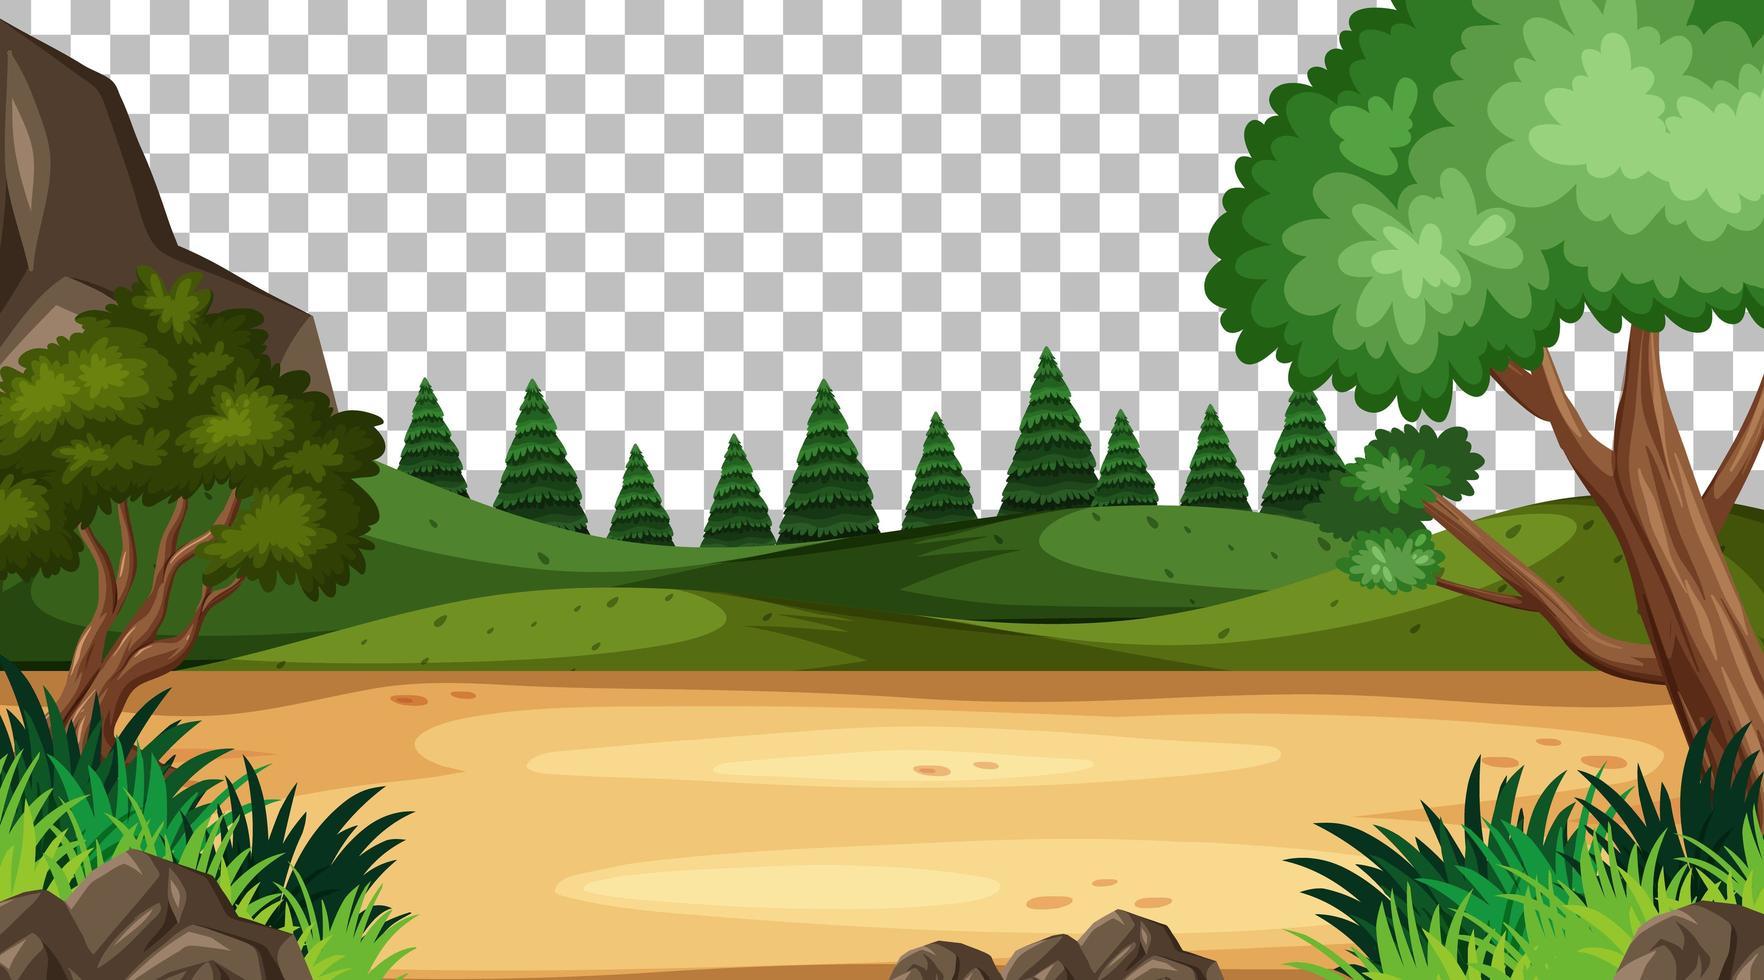 tom natur park scen på transparent bakgrund vektor